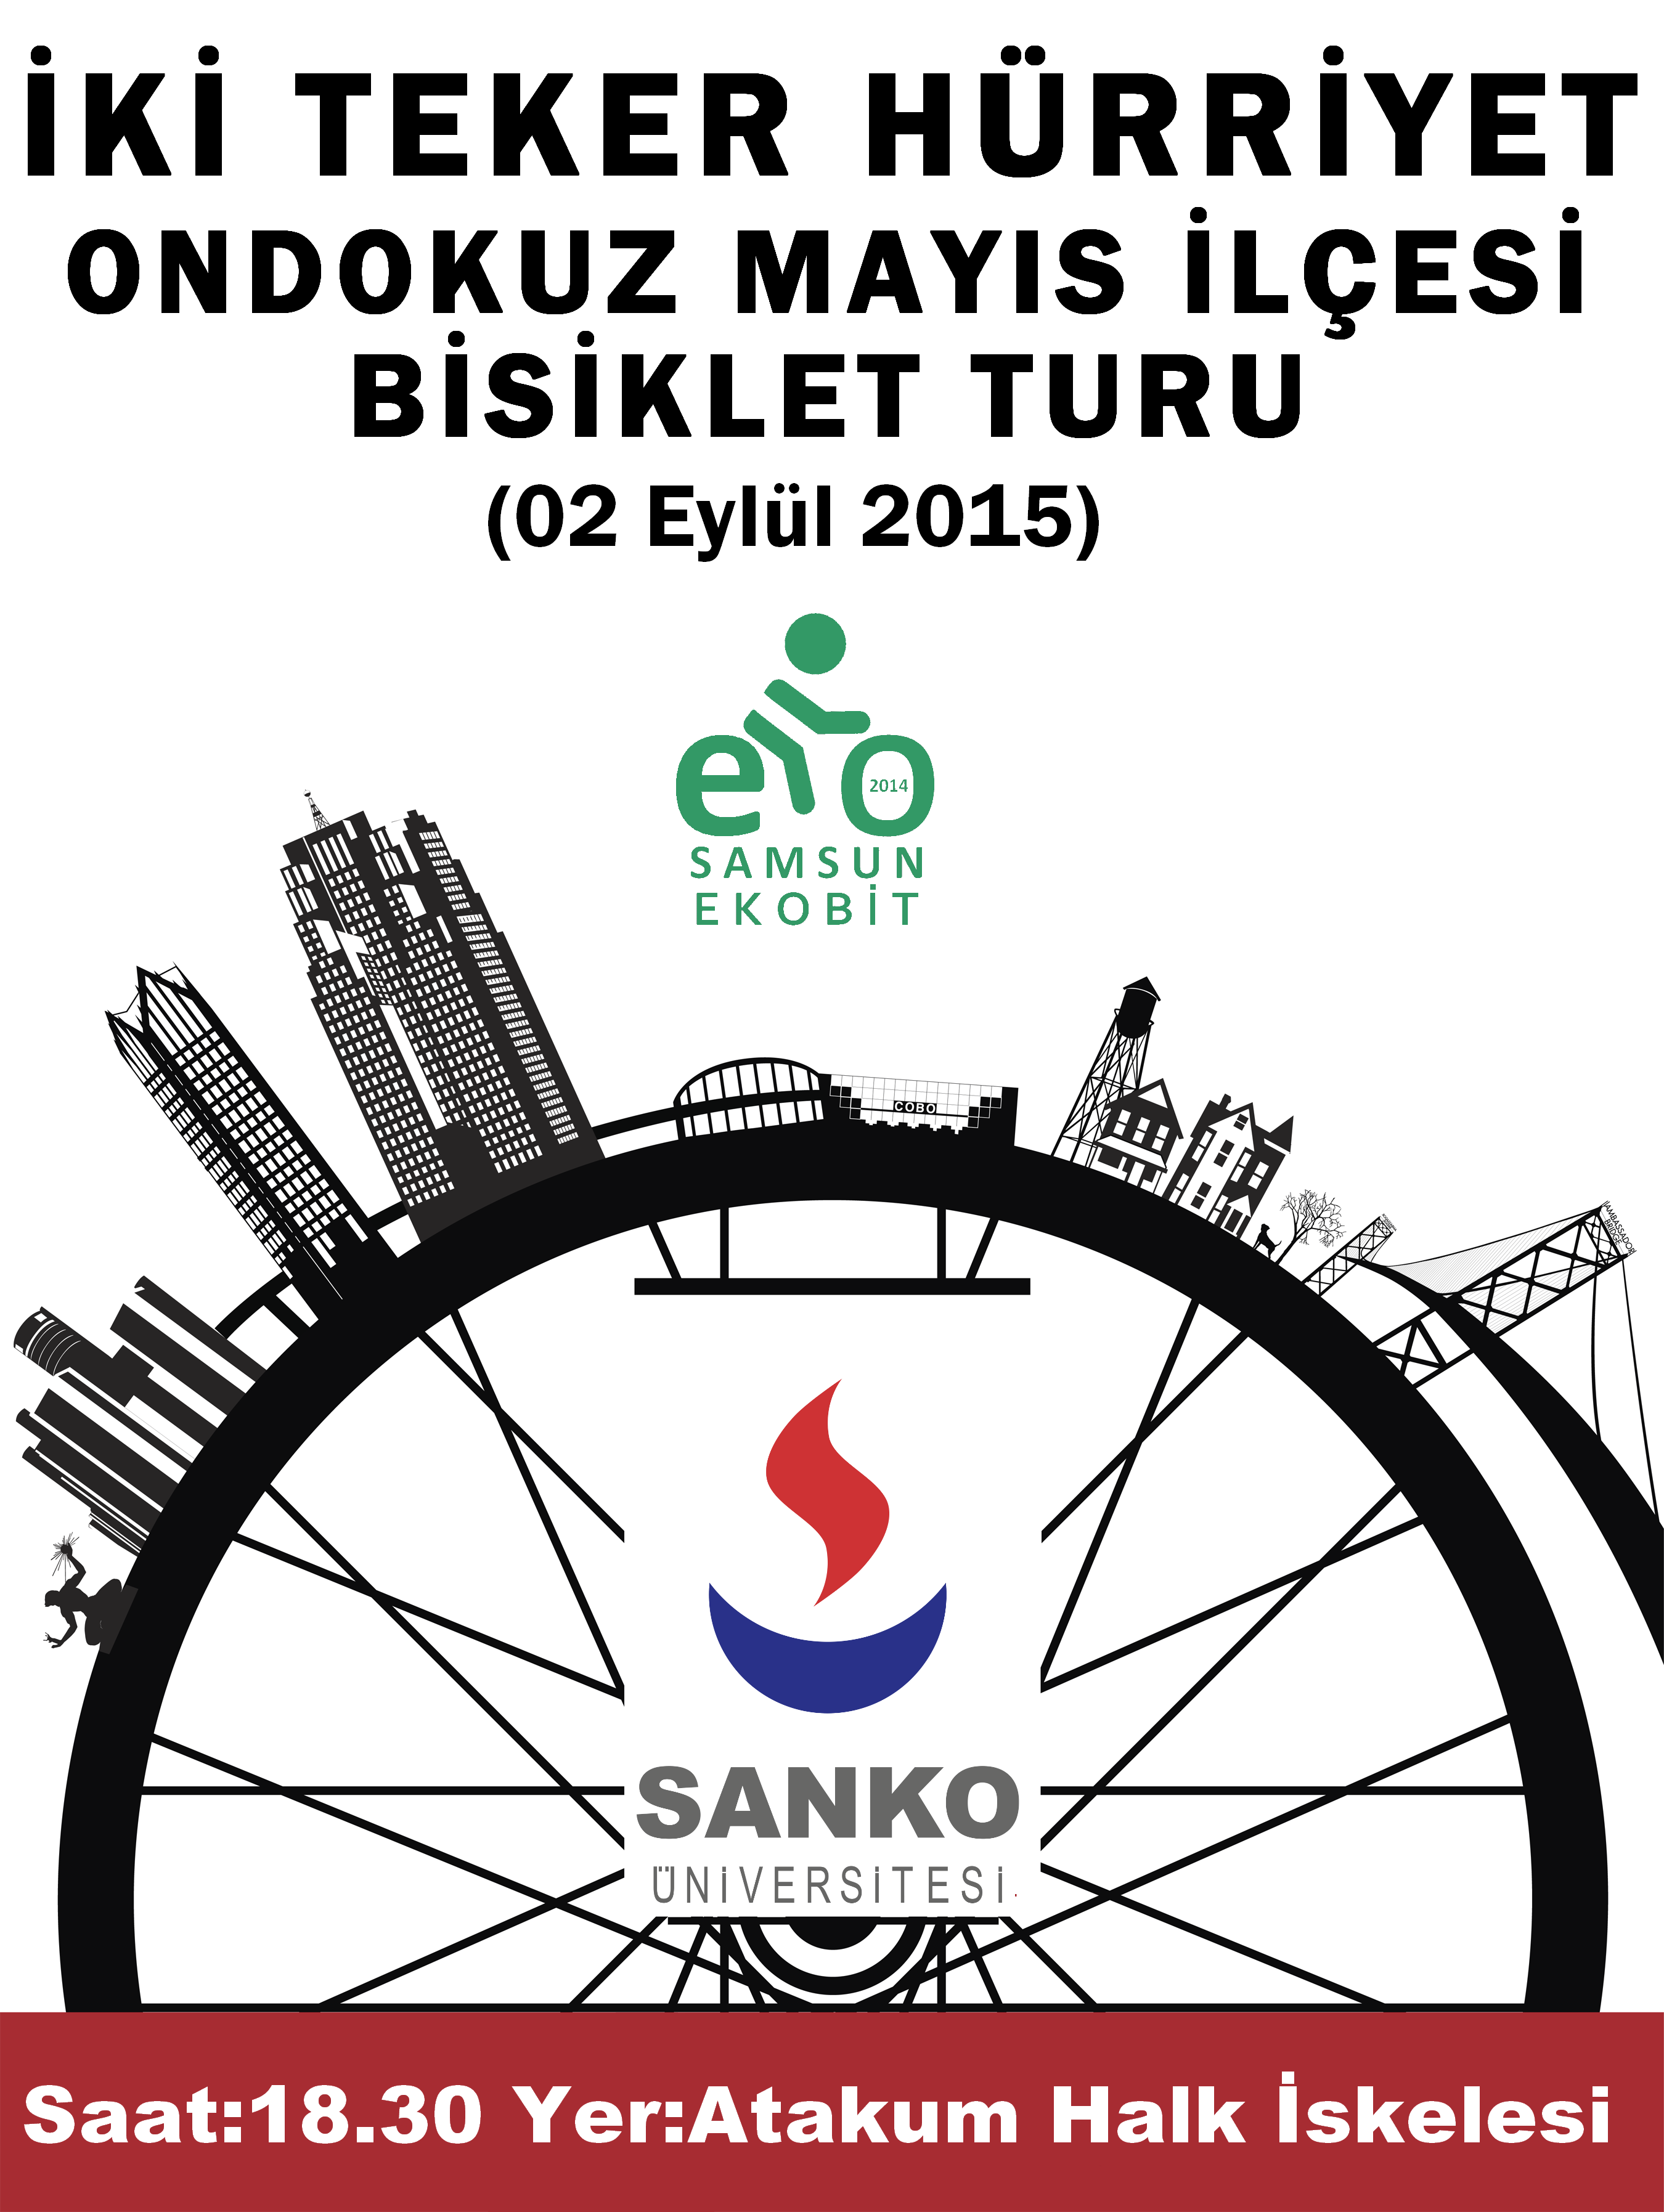 Ondokuz Mayıs Bisiklet Turu